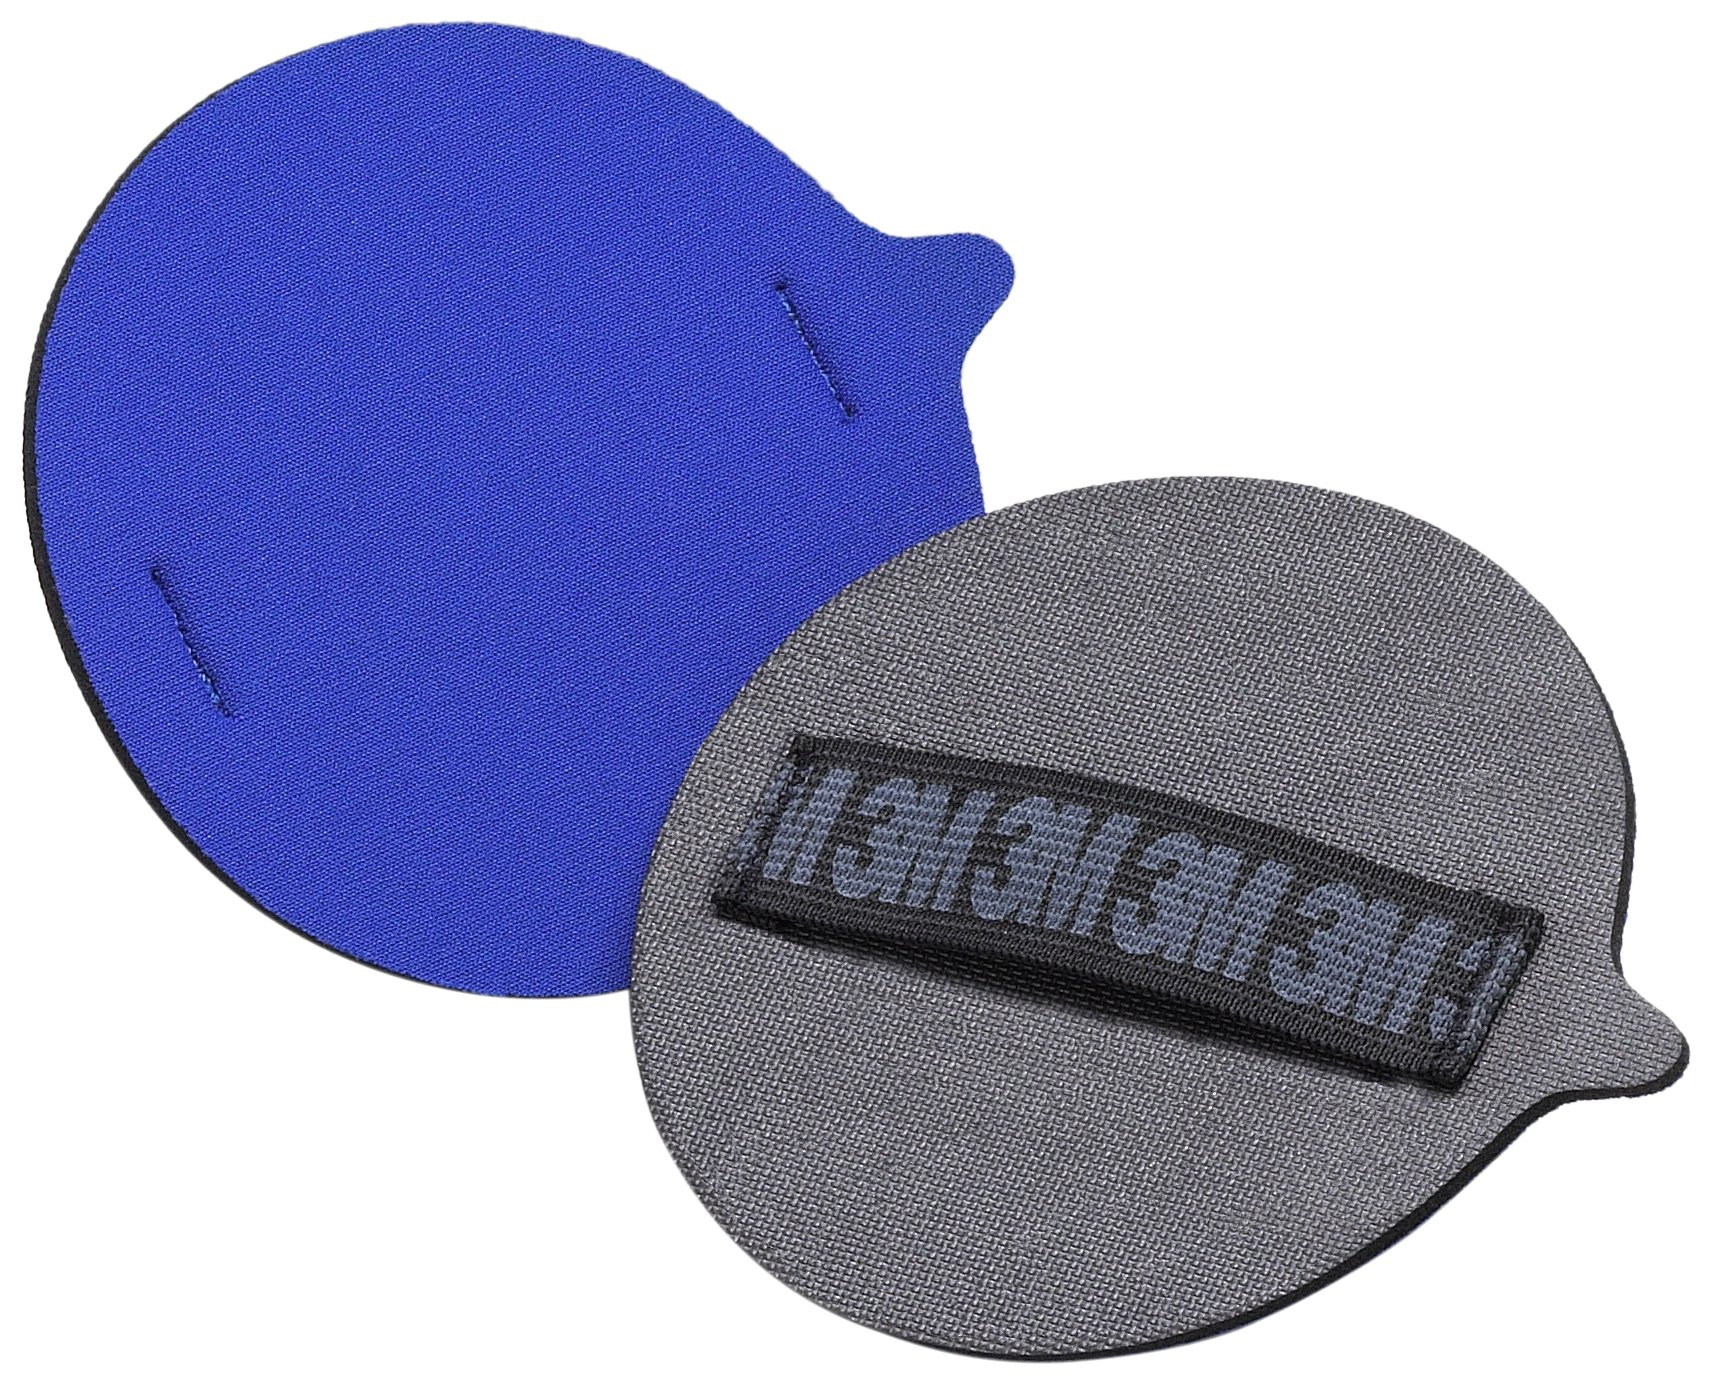 Pack of 20 1//4 Thick 5 Diameter 3M Stikit Disc Hand Pad 45189 Blue//Black 5 Diameter 1//4 Thick